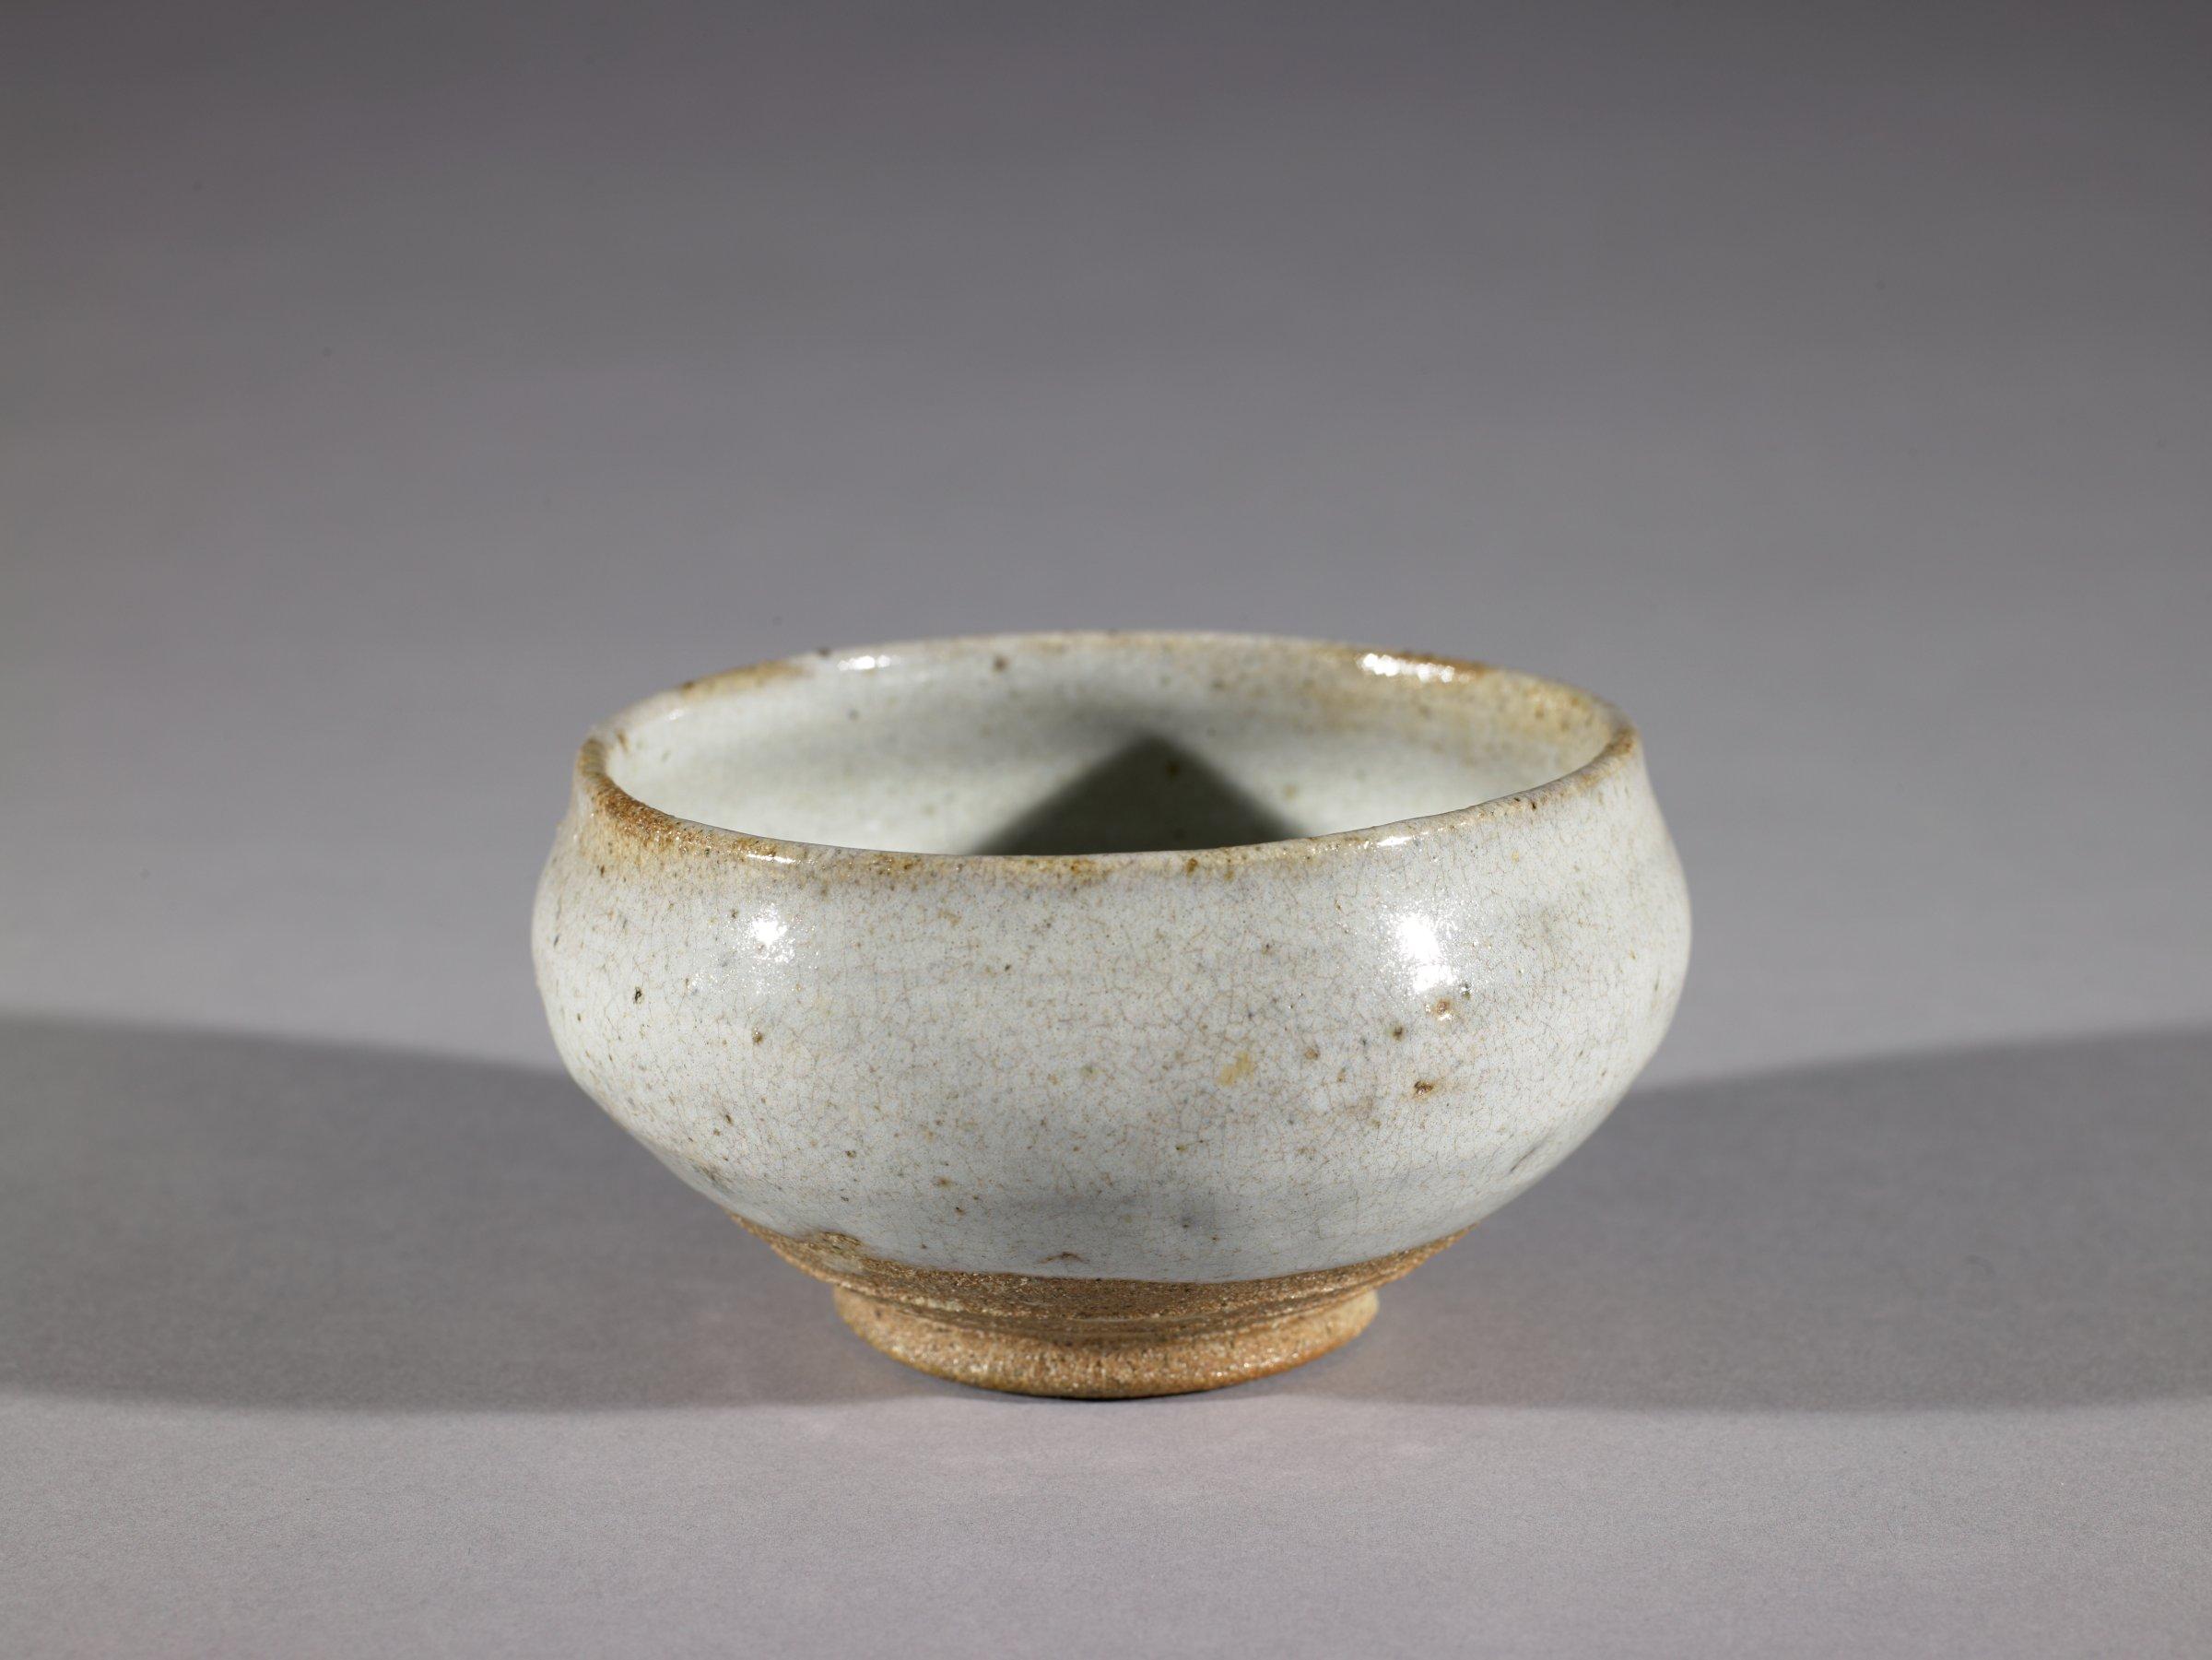 Possibly Mishima ware